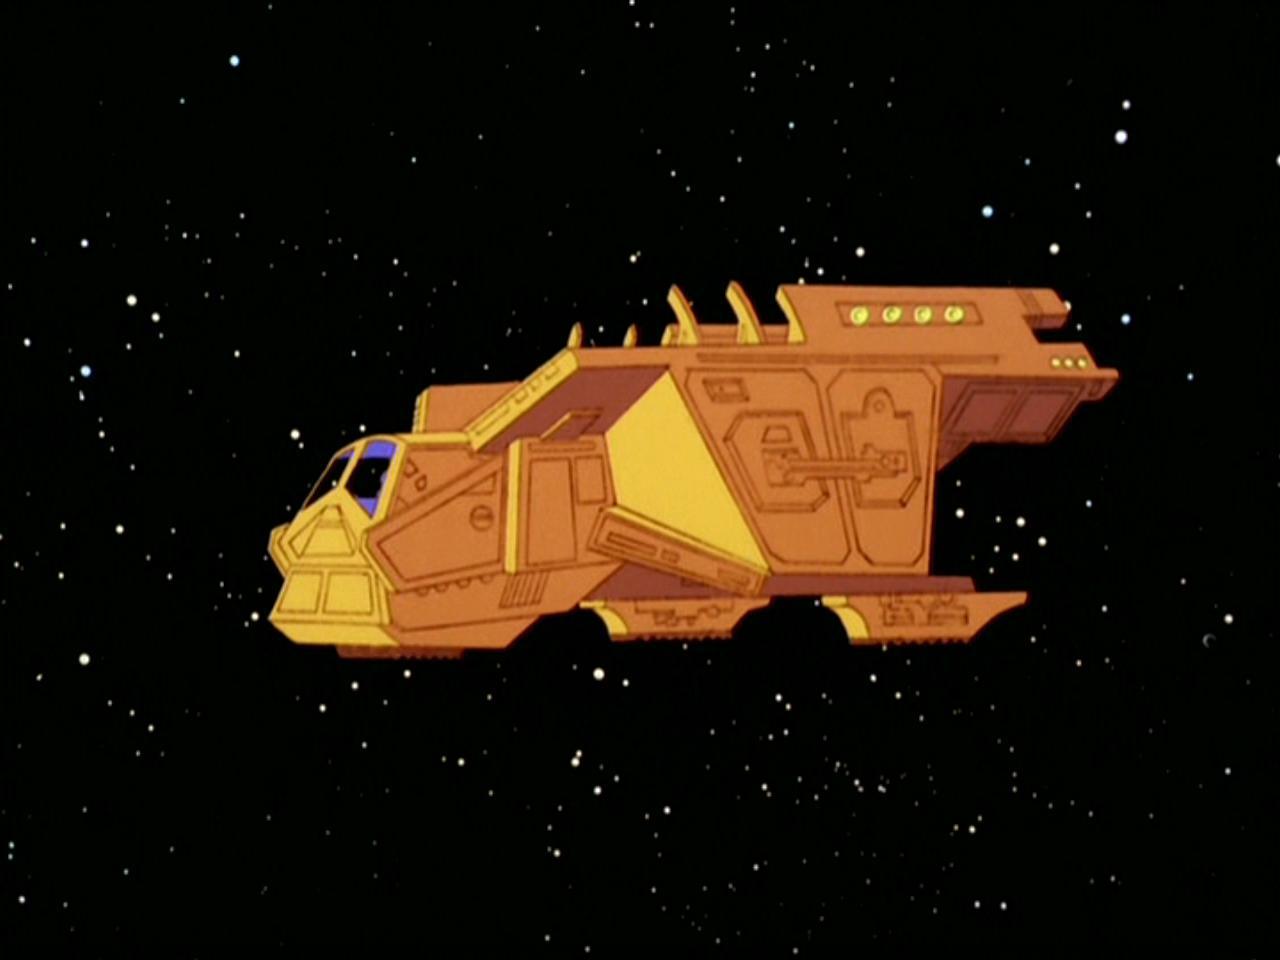 Dramen patrol ship